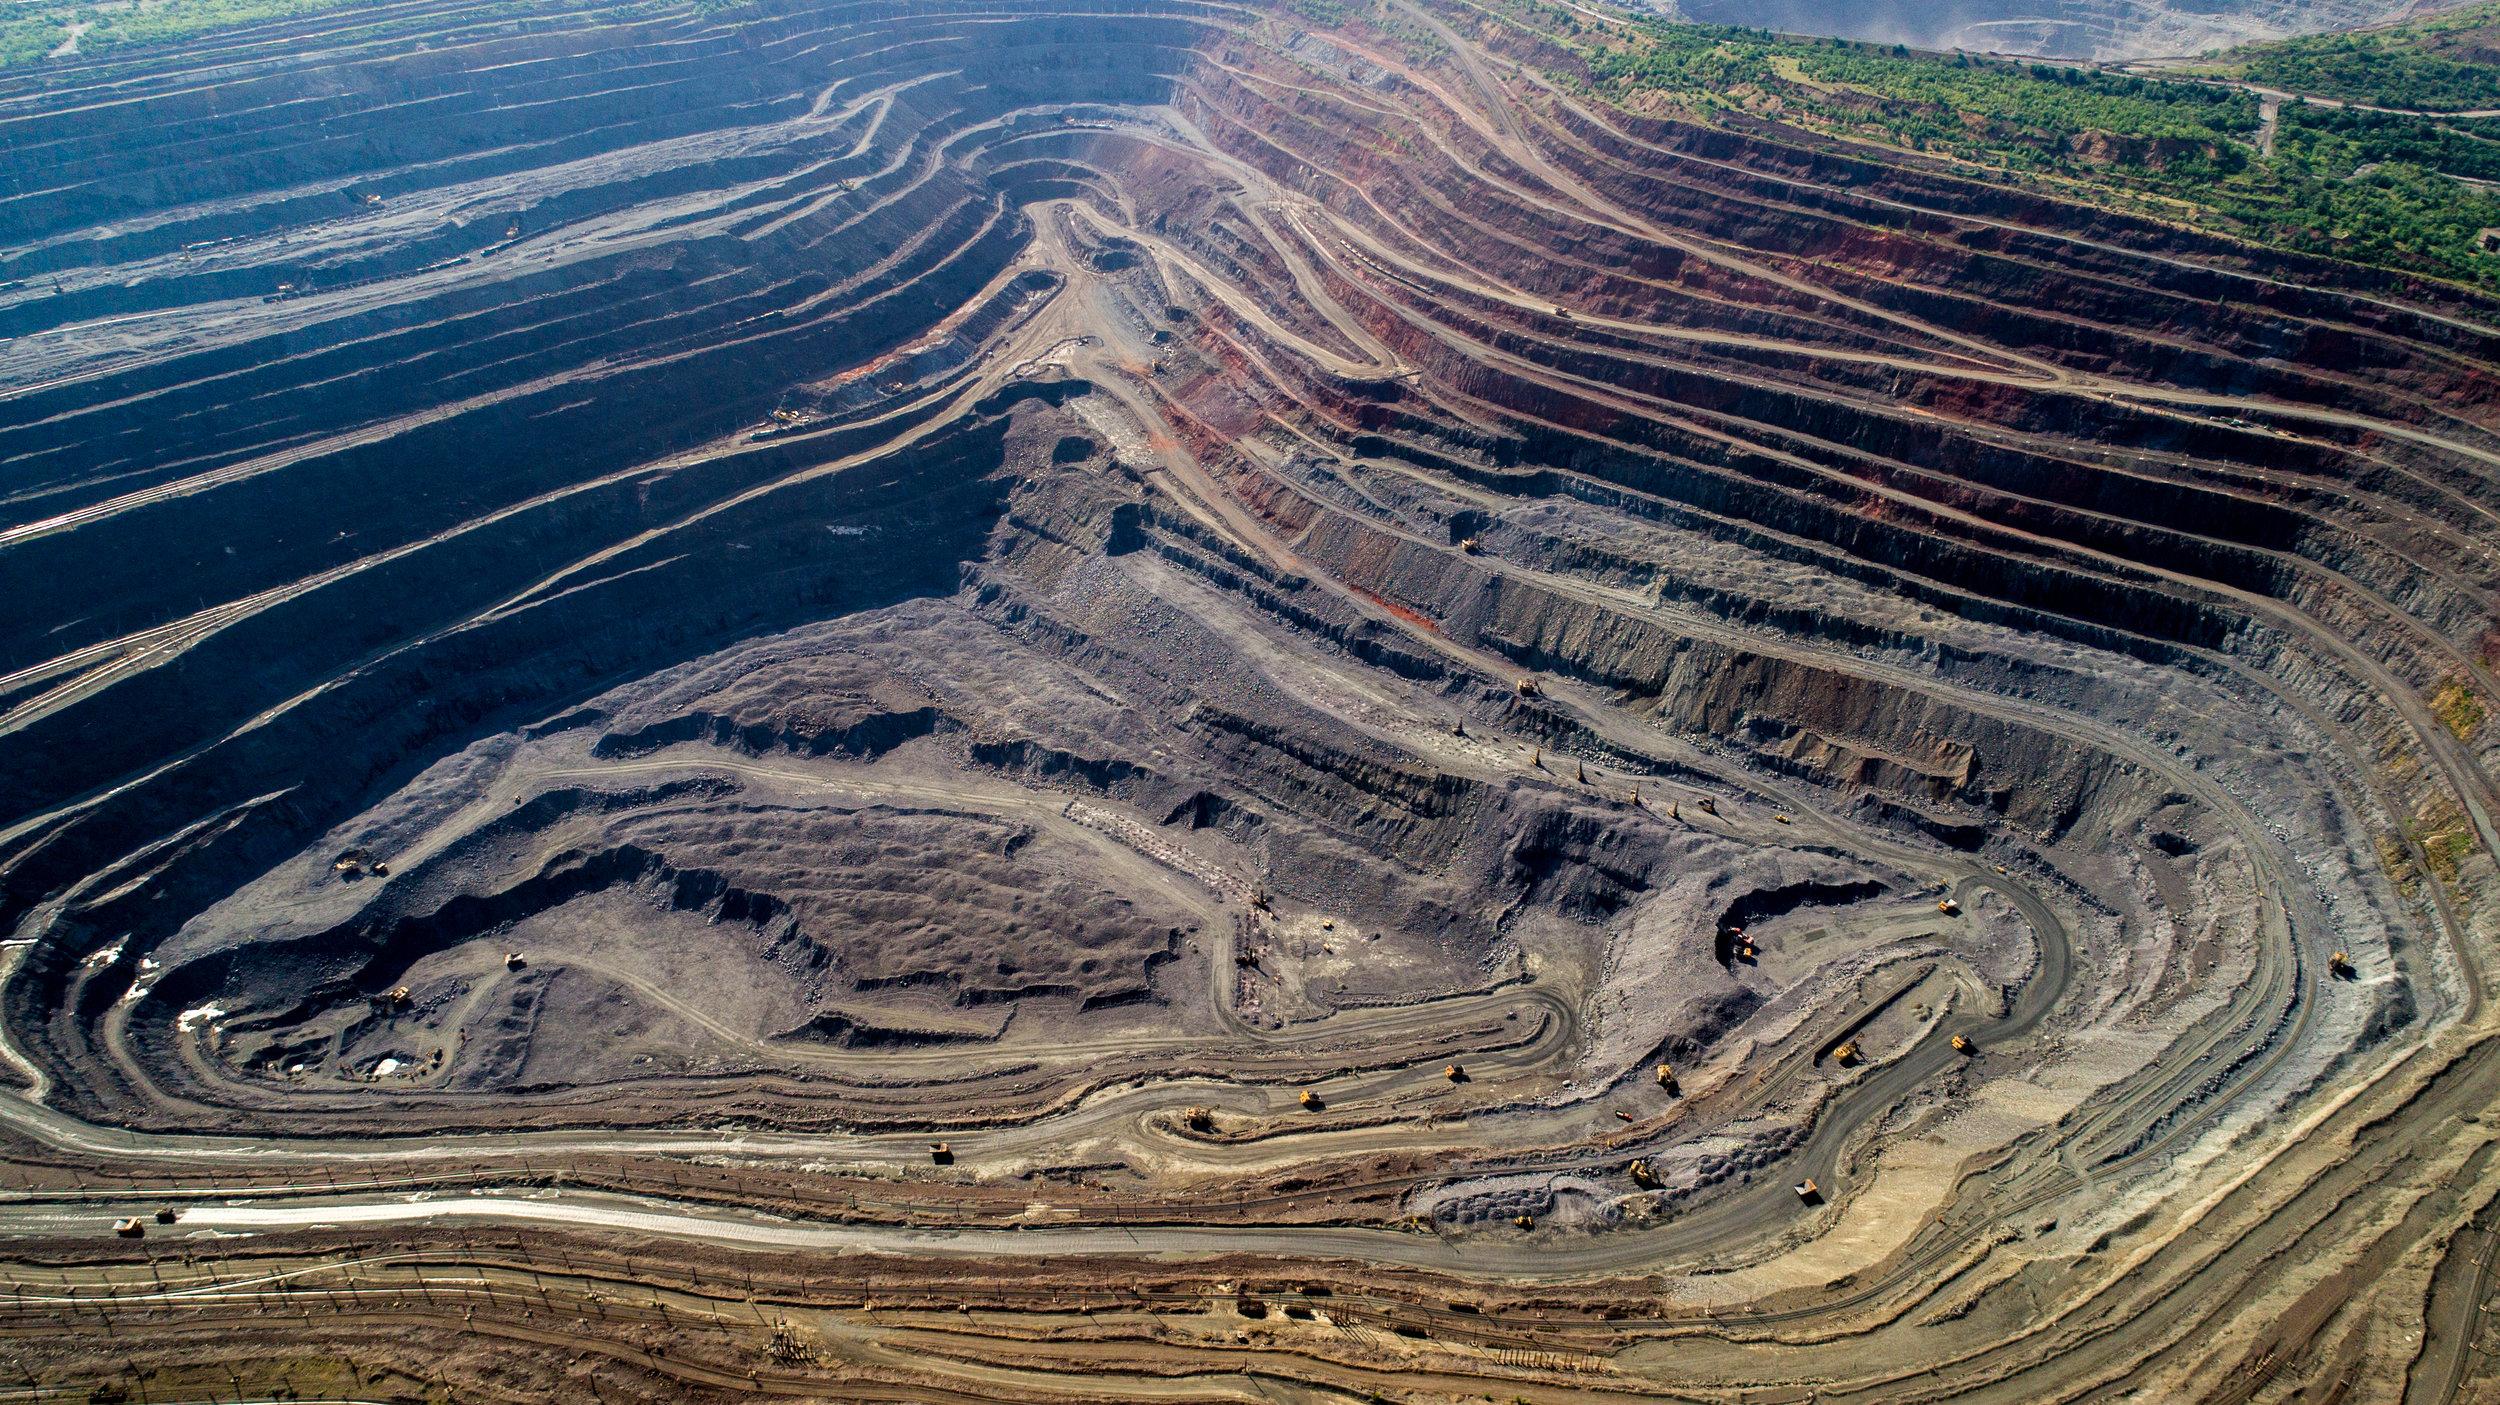 bigstock-Aerial-View-Of-Opencast-Mining-245402191.jpg